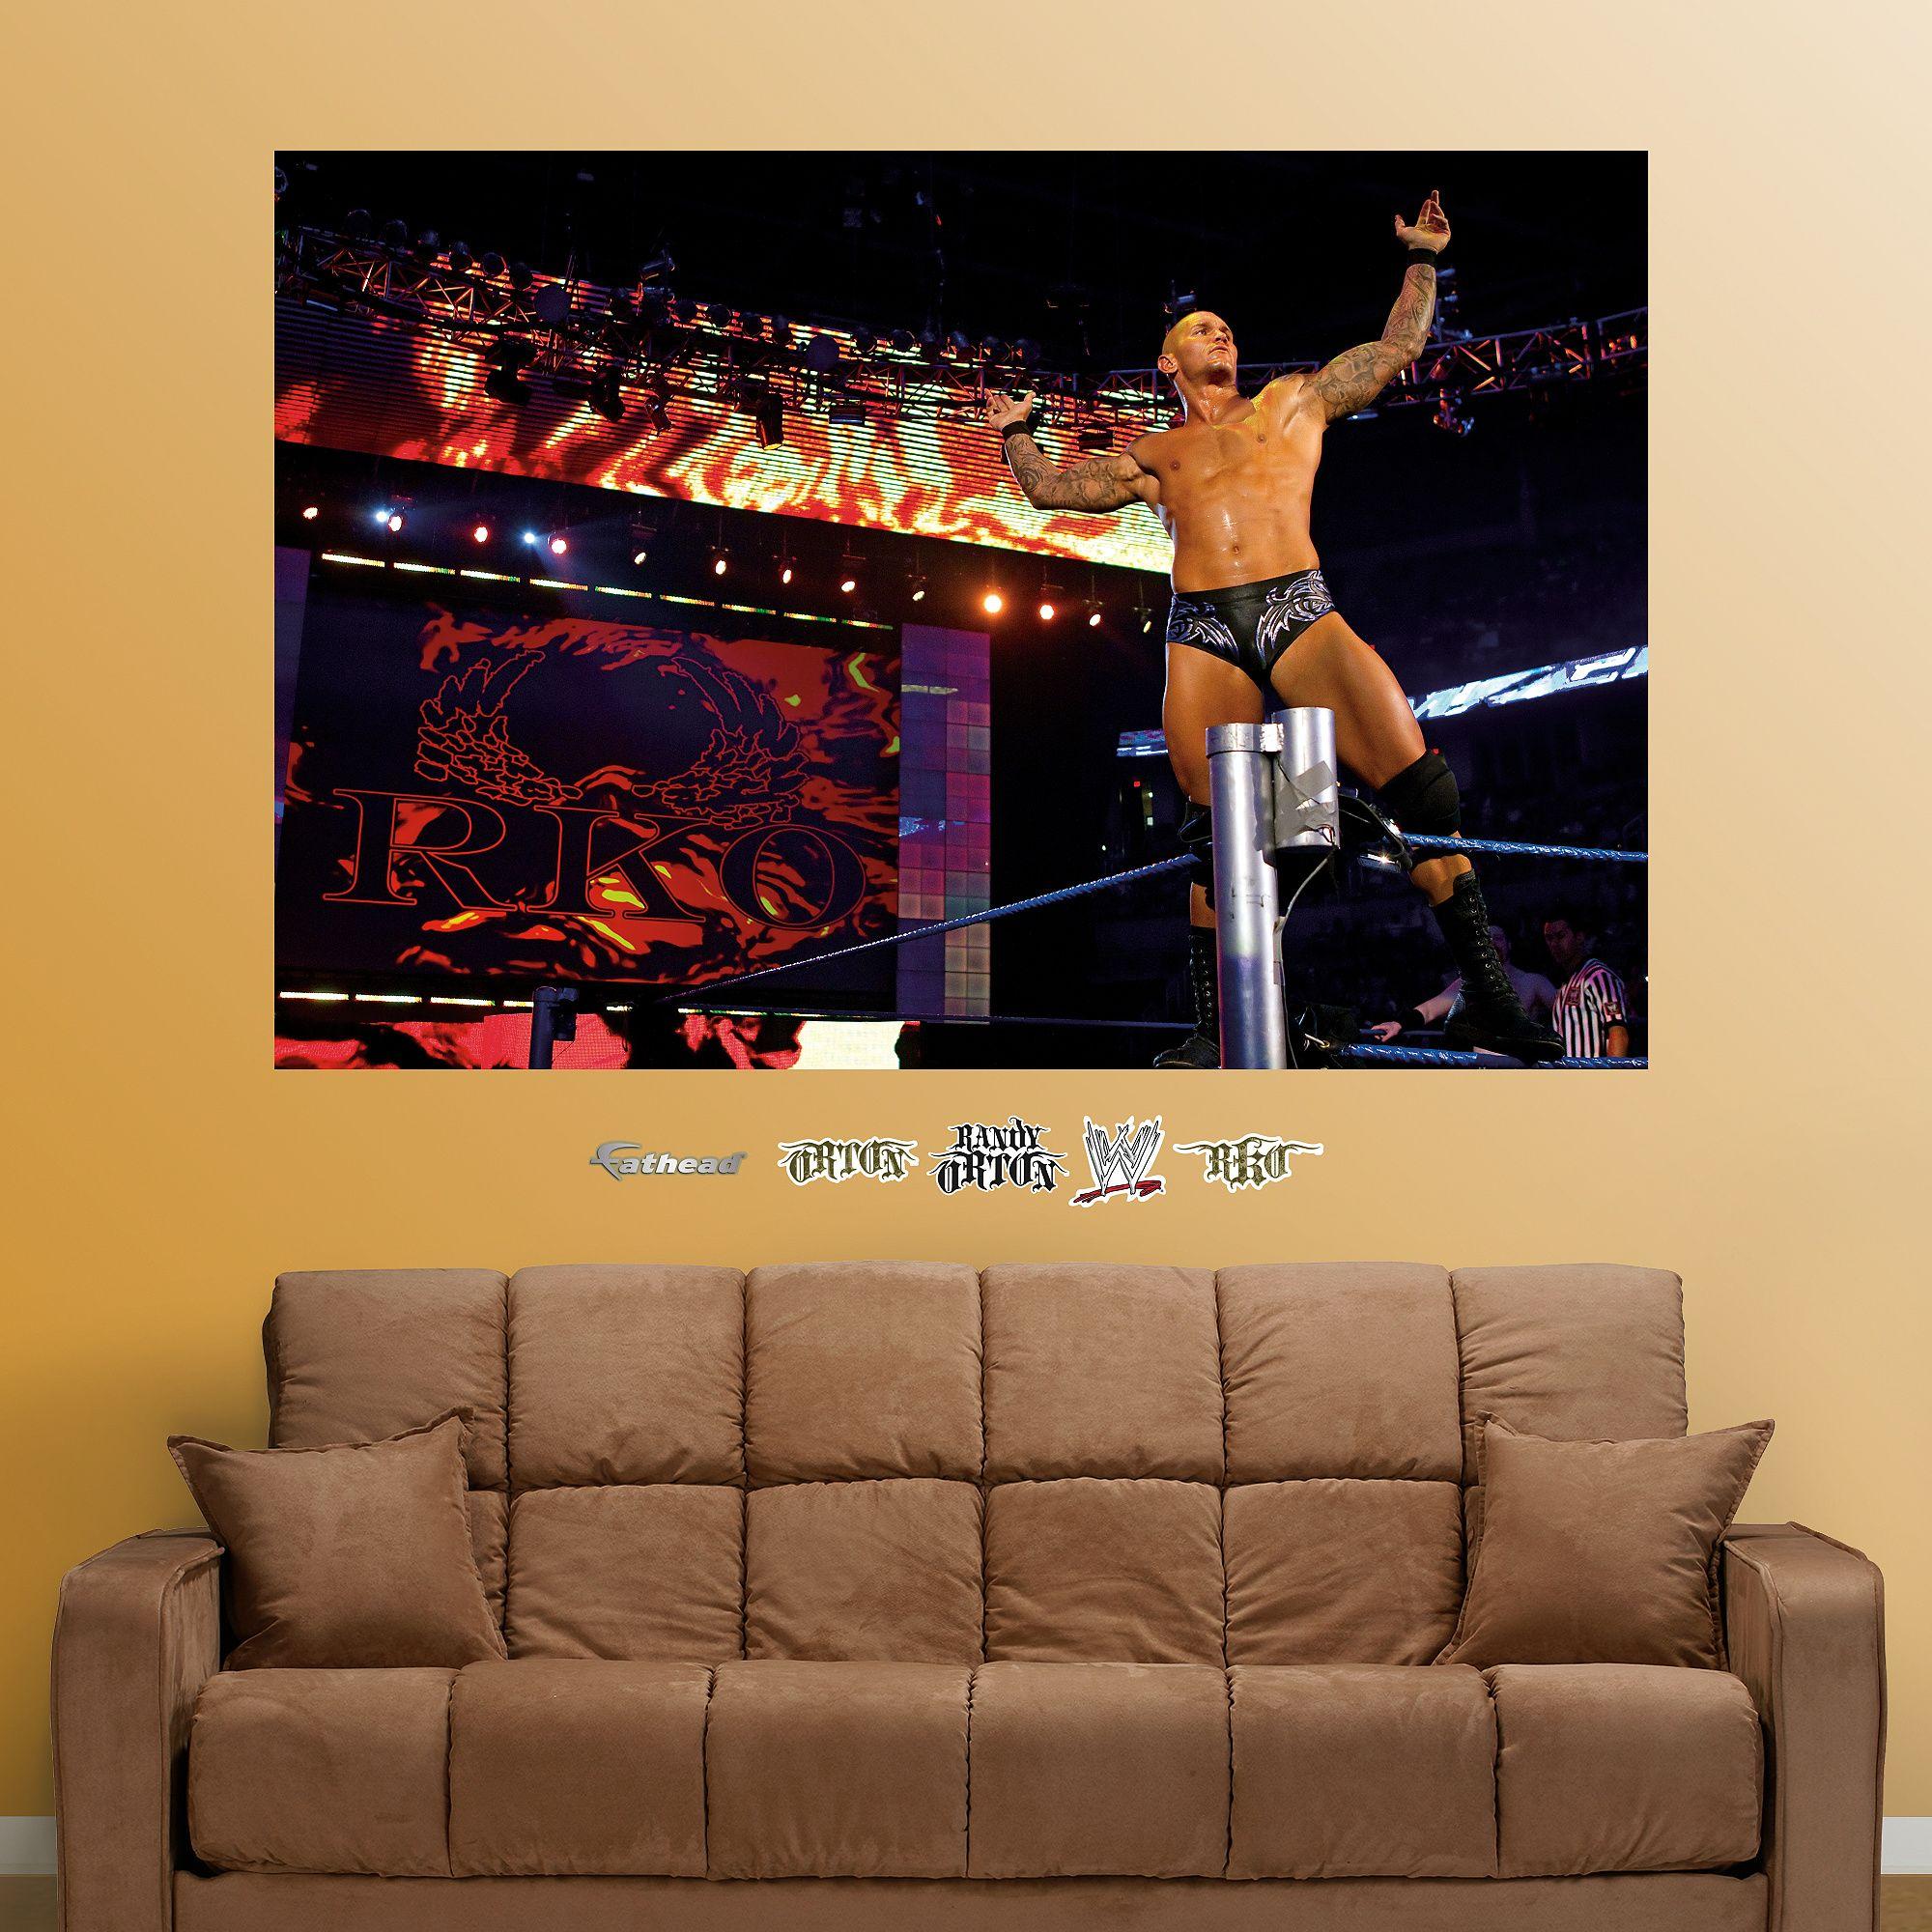 Randy Orton Mural WWF Pinterest Wrestling wwe and Randy orton